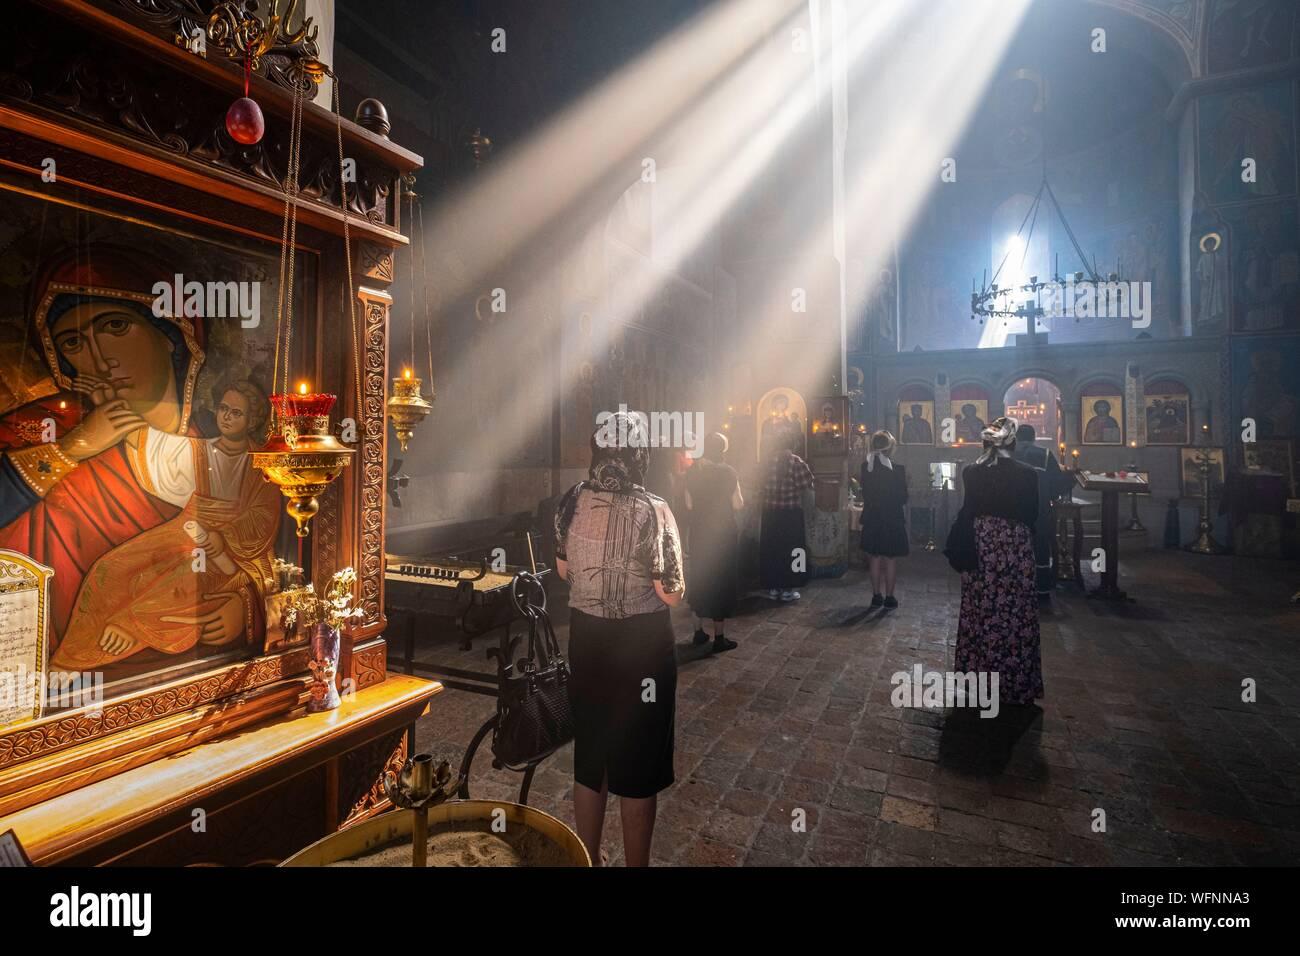 Georgien, Tiflis, Tiflis oder Dzveli Kalaki, Bethlehem Bezirk (oder Kldisoubani), Bethlehem Kirche Stockfoto